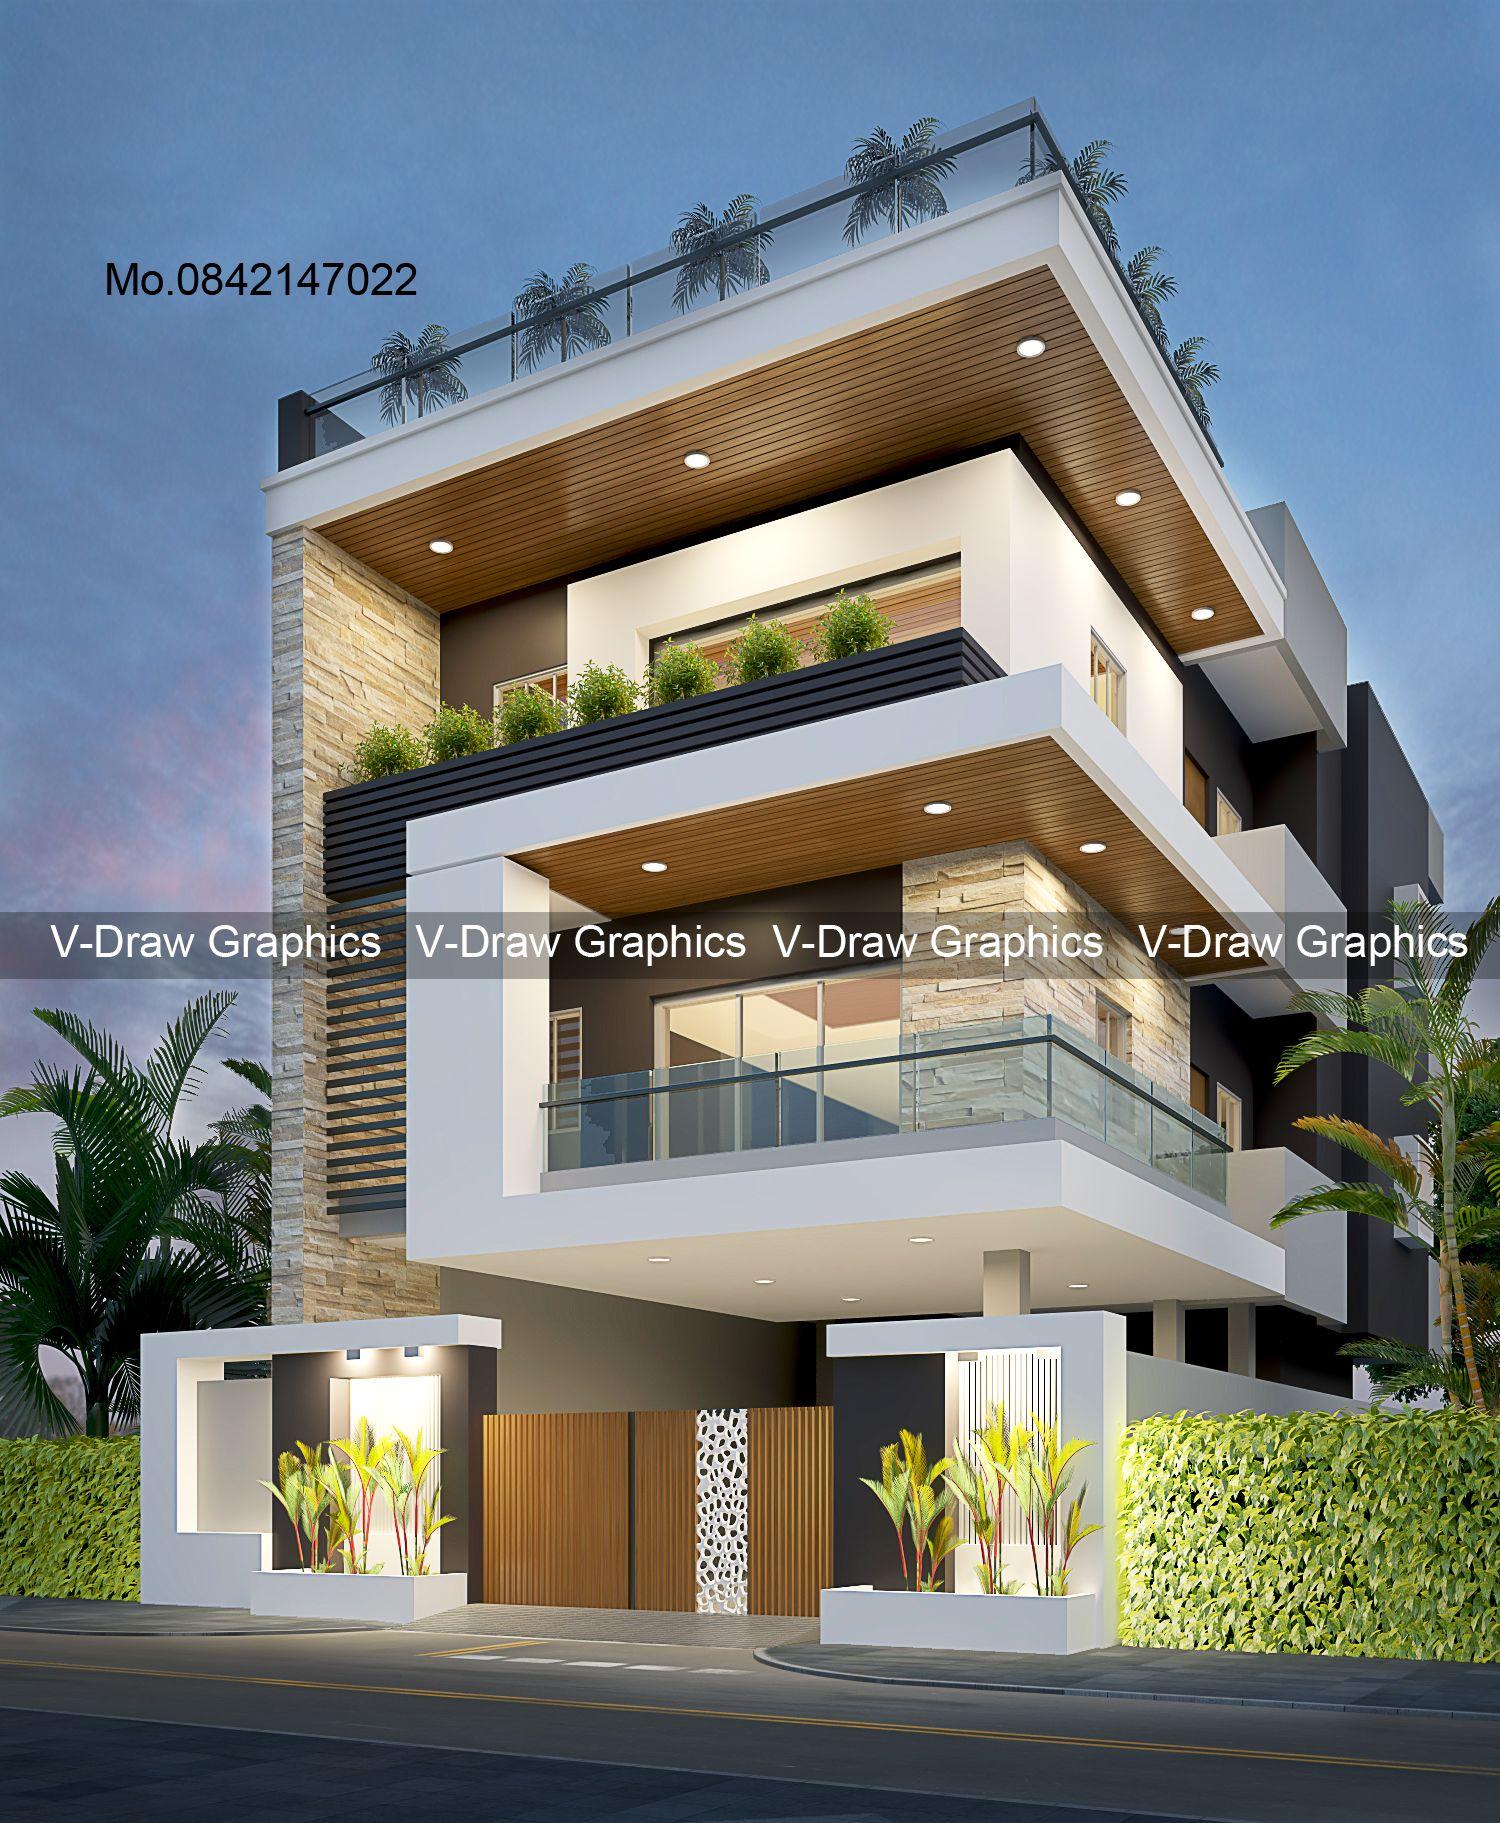 Pin By Raj Shikar On Exterior Design 3 Storey House Design Bungalow House Design Small House Elevation Design